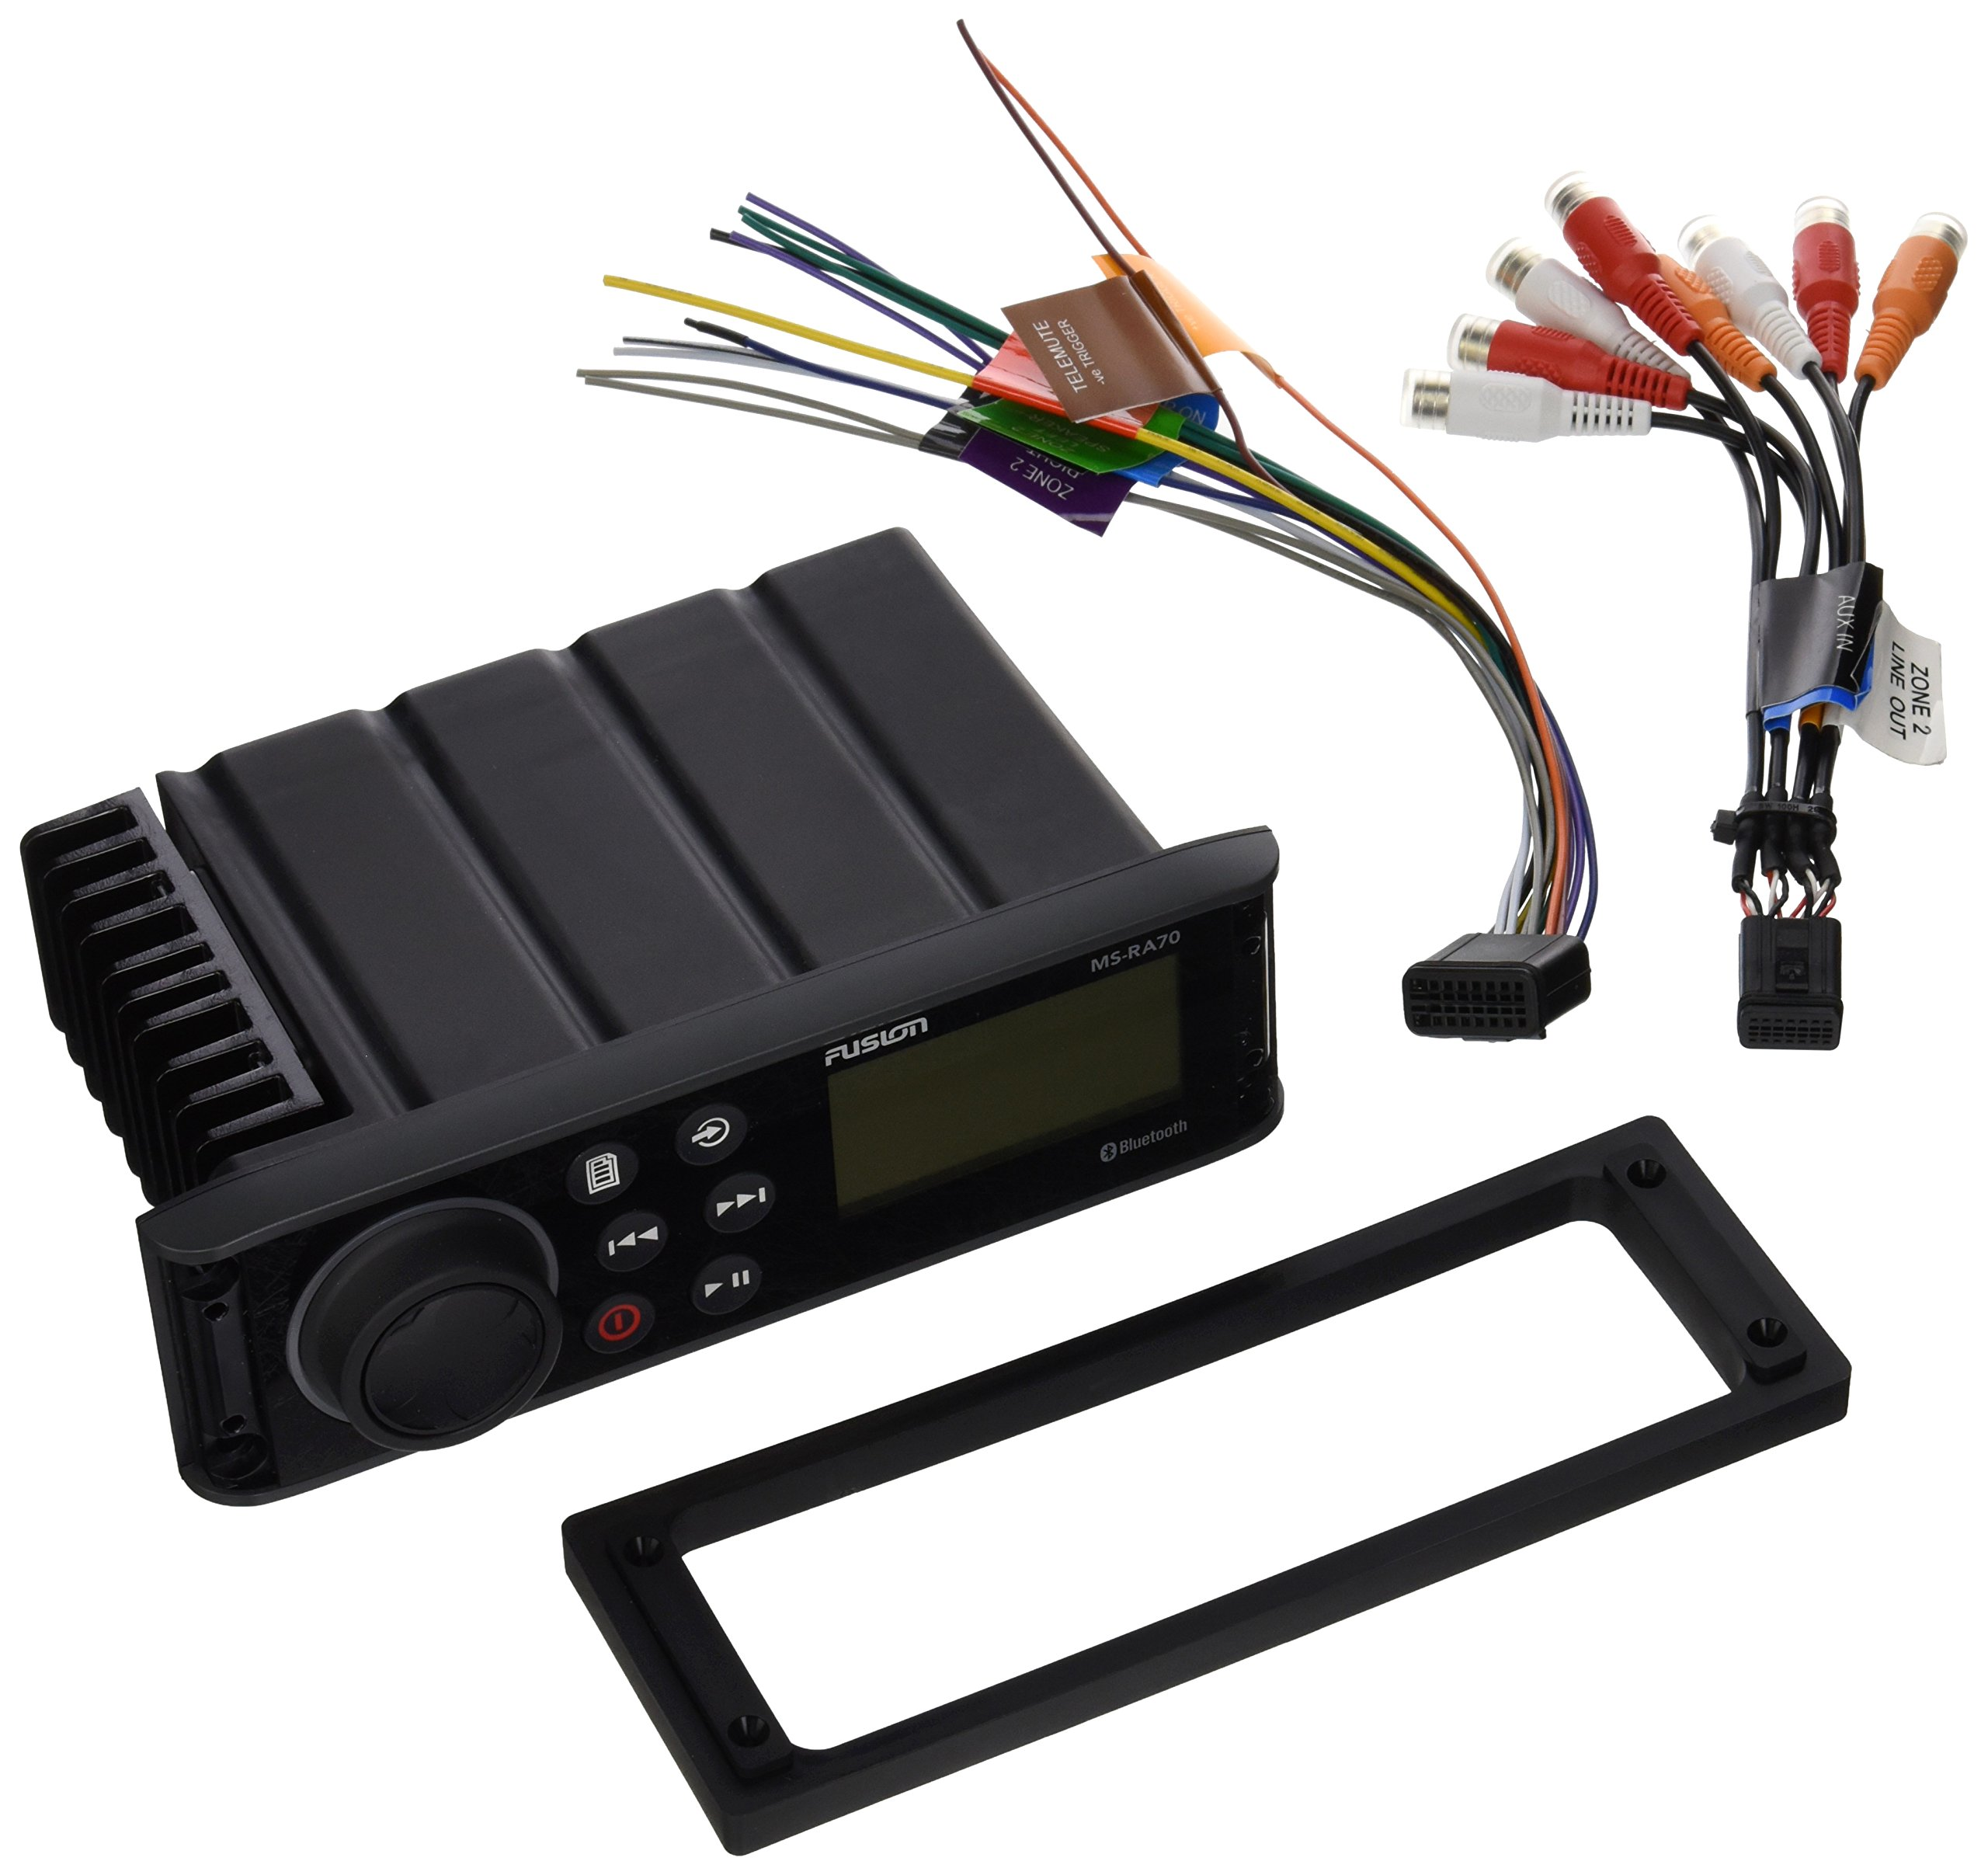 Fusion MS-RA70I Stereo with 4x50W AM/FM/Bluetooth 2-Zone USB Wireless Control Link App